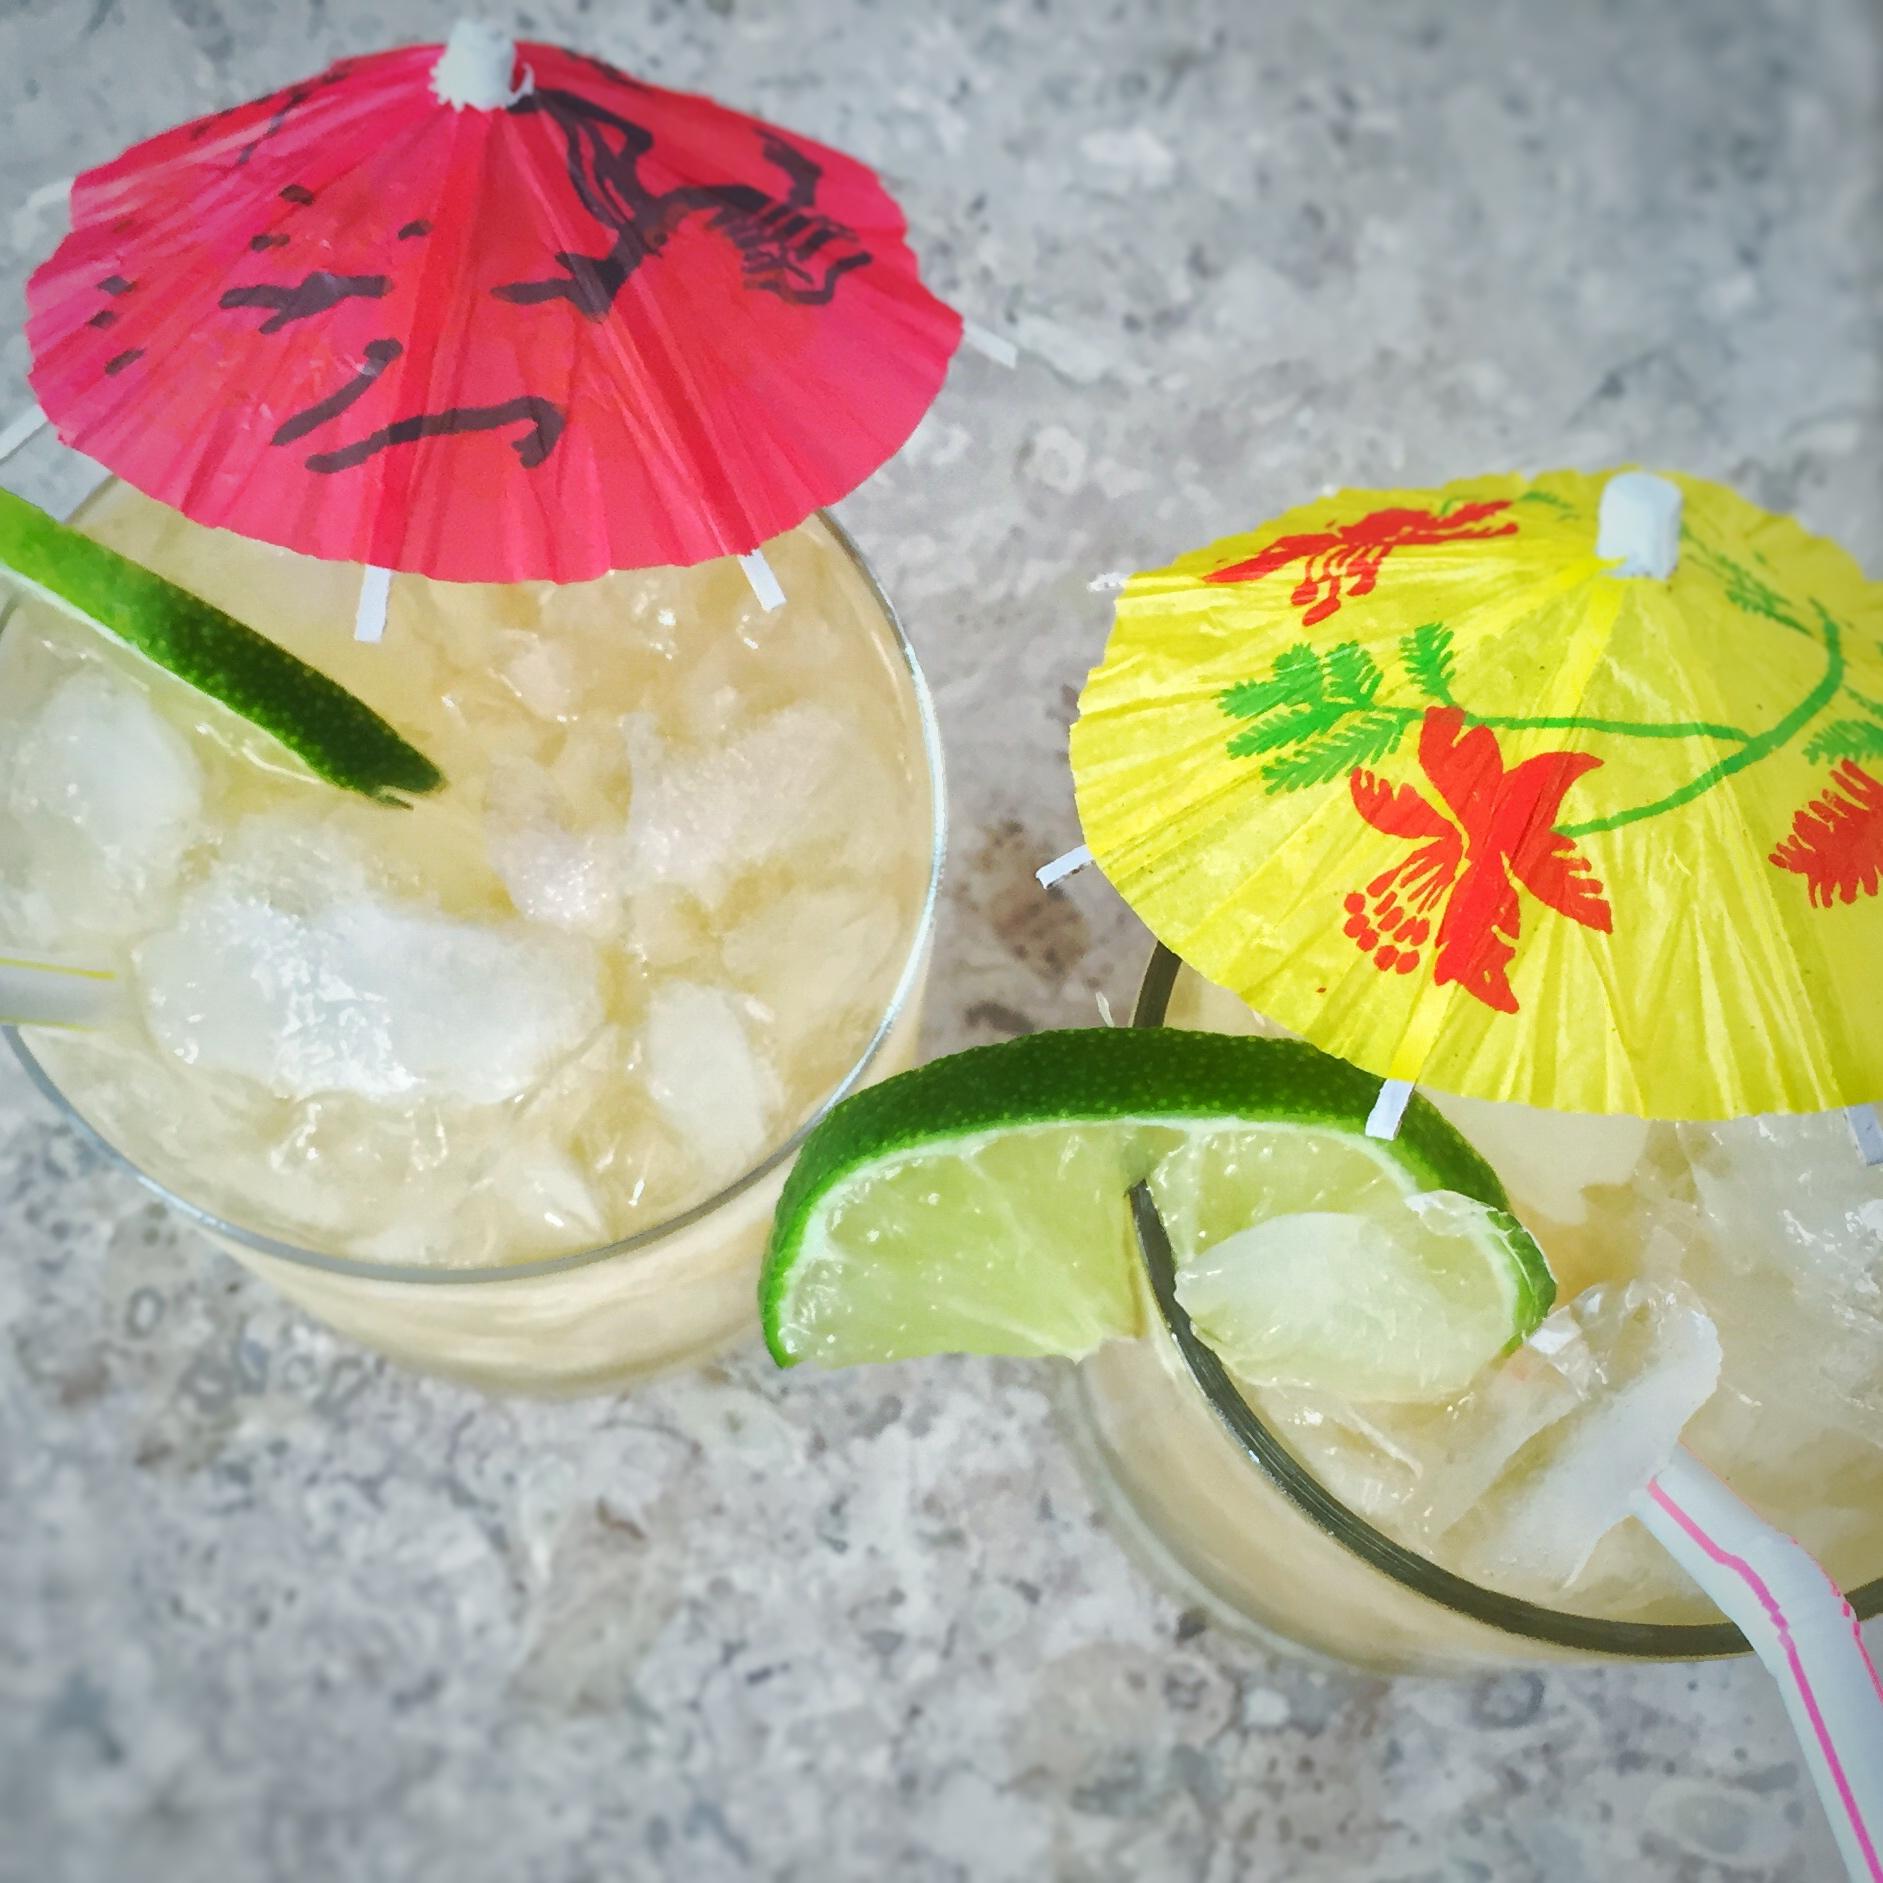 fernet branca Archives - Let's Drink About It